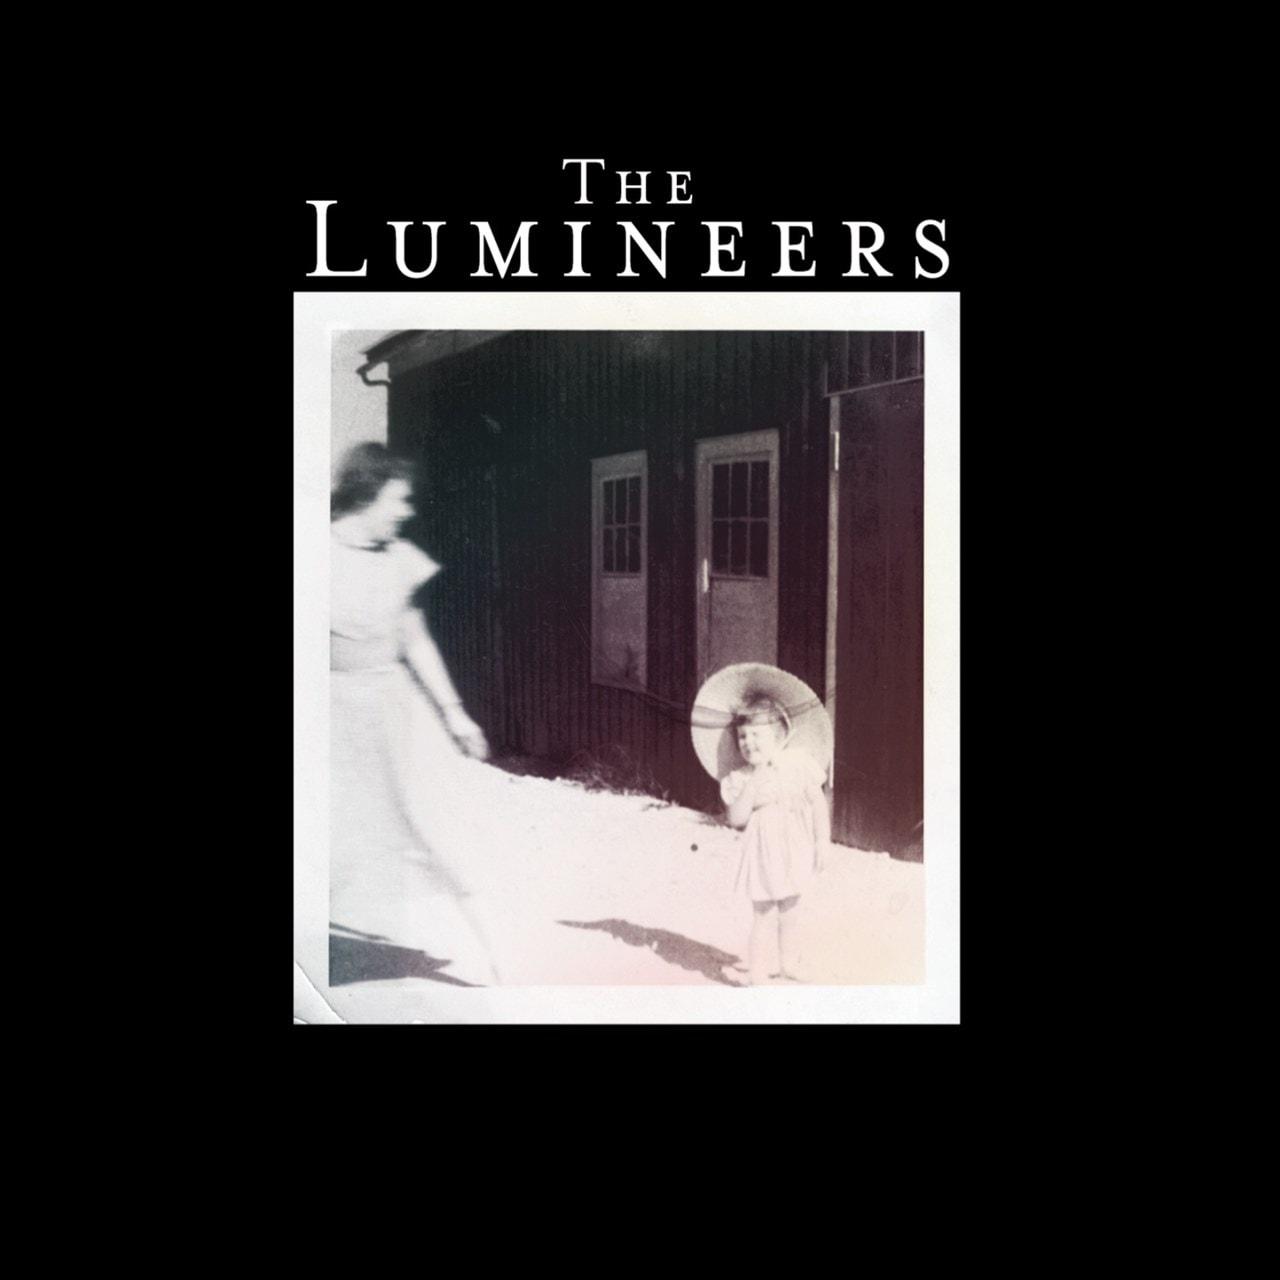 The Lumineers - 1